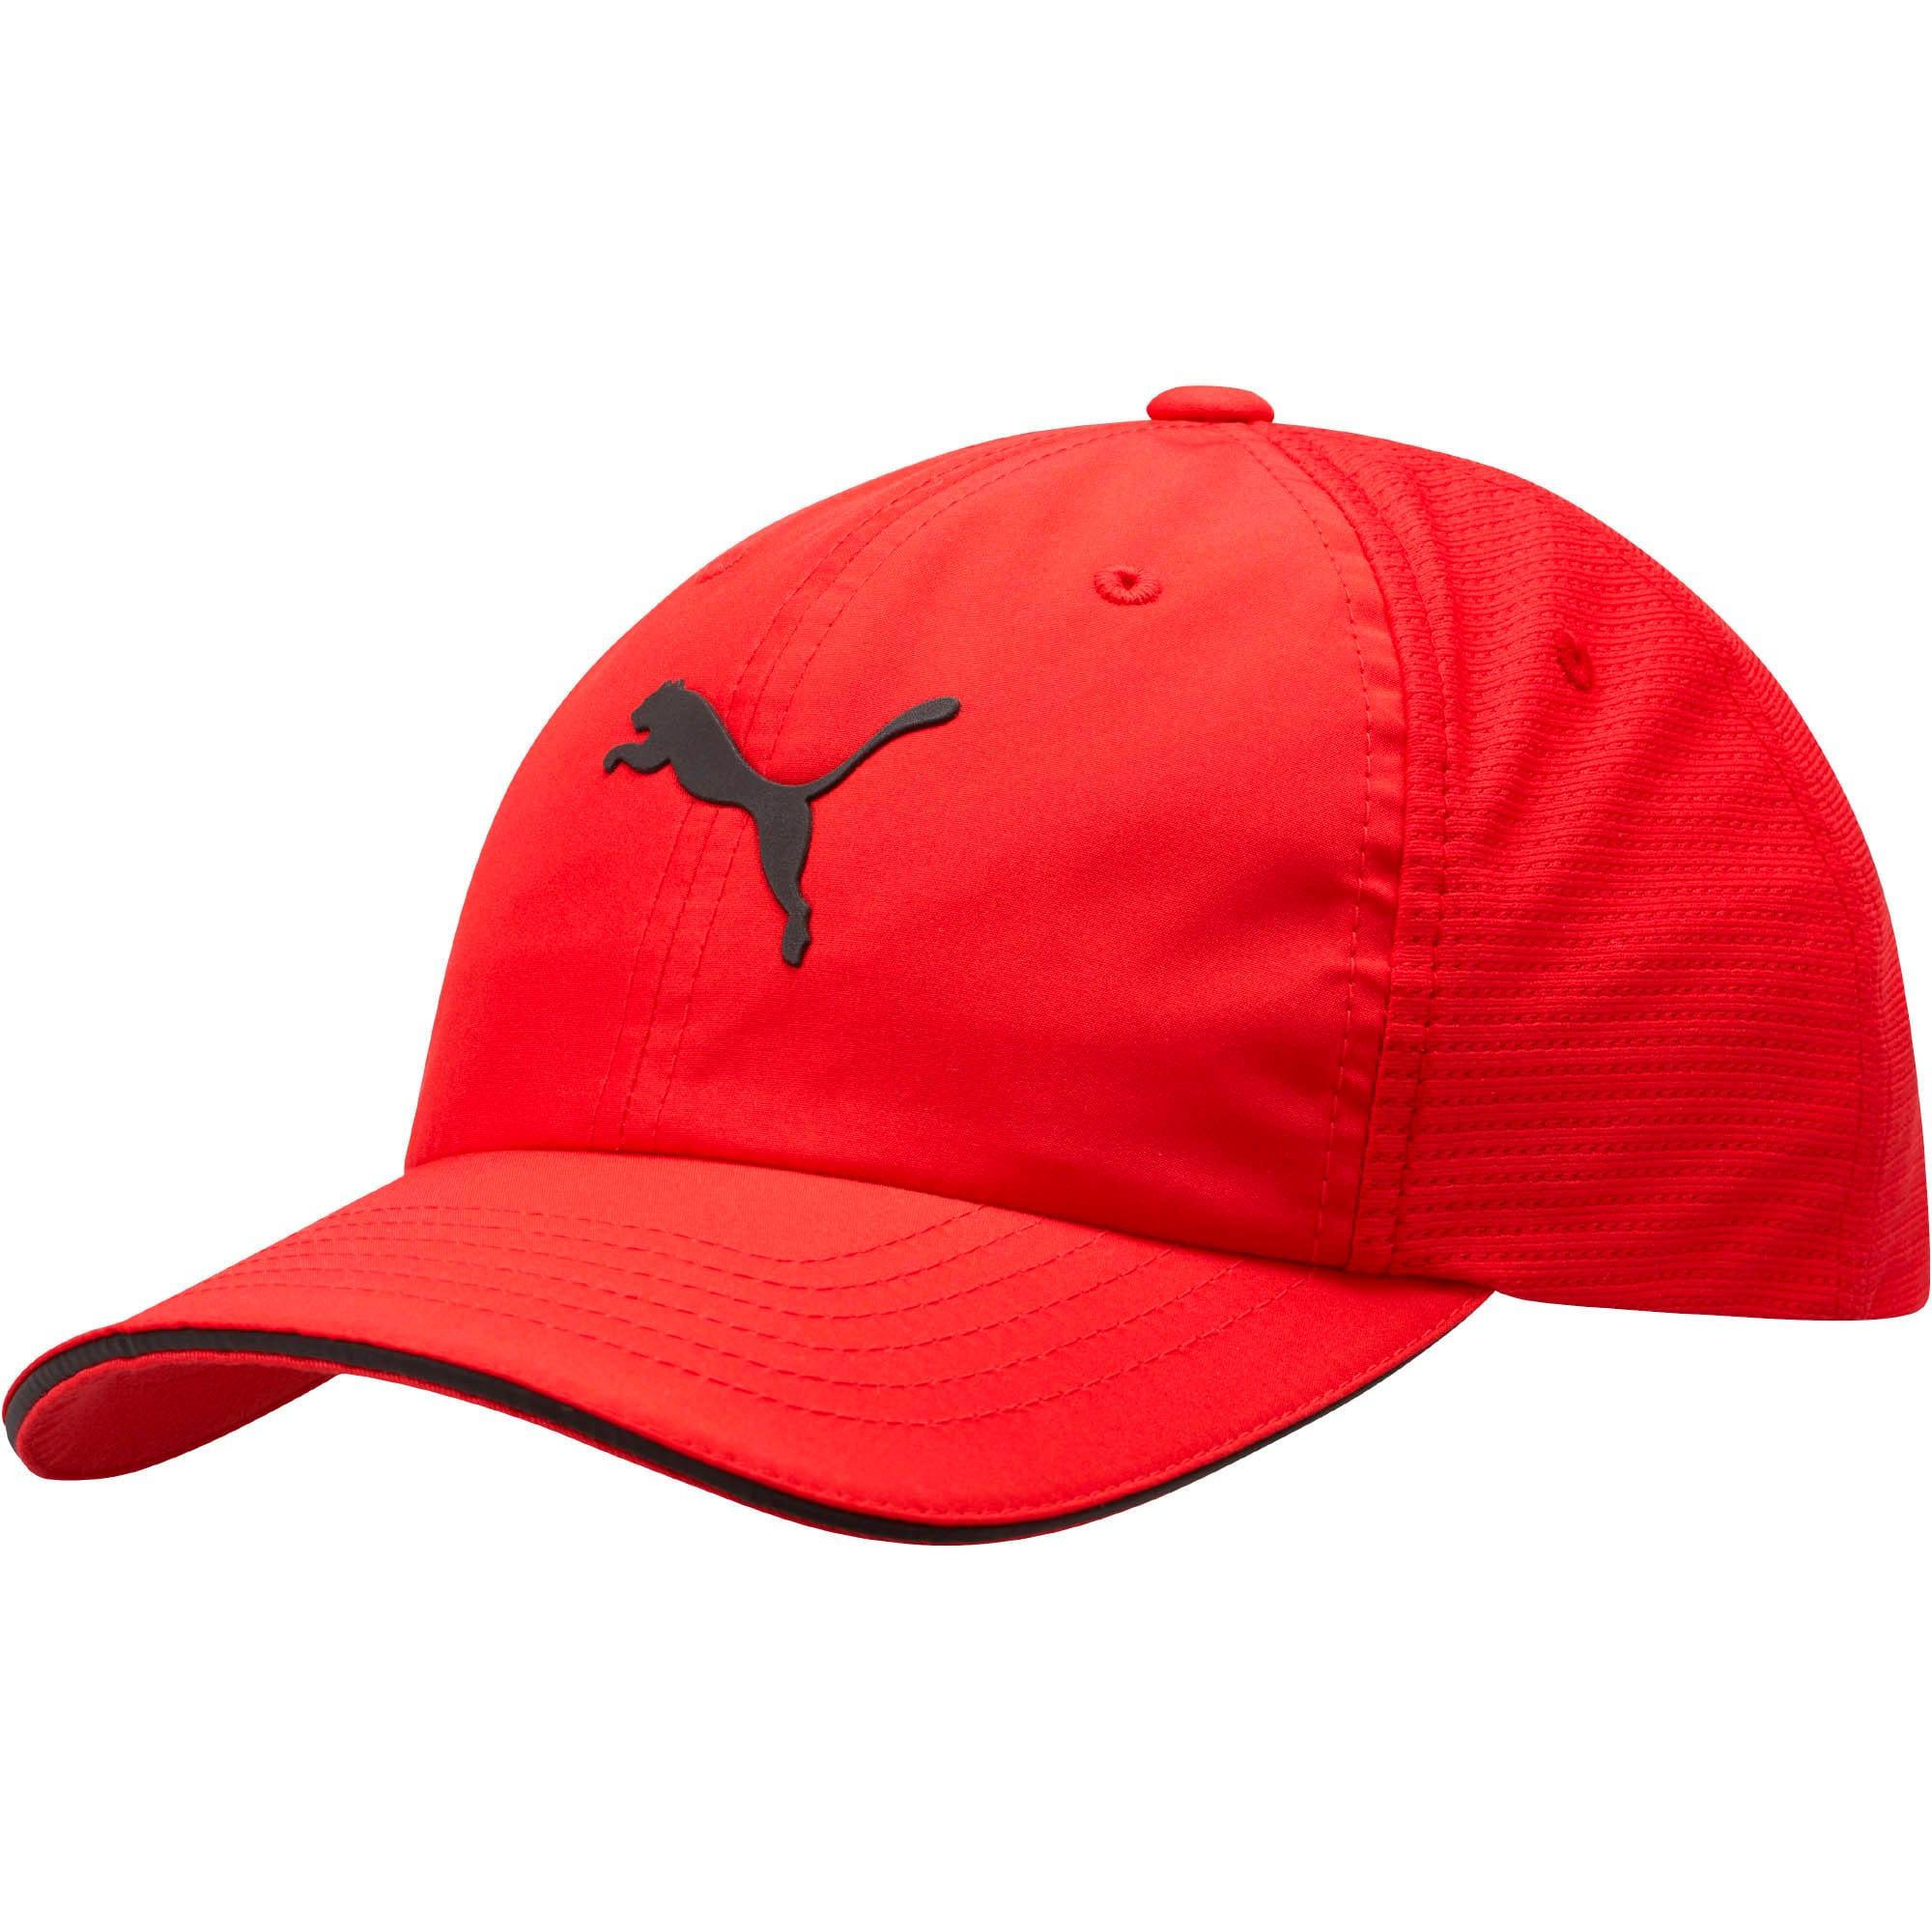 Miniatura 1 de Gorra de malla para correr, Rojo/Negro, mediano